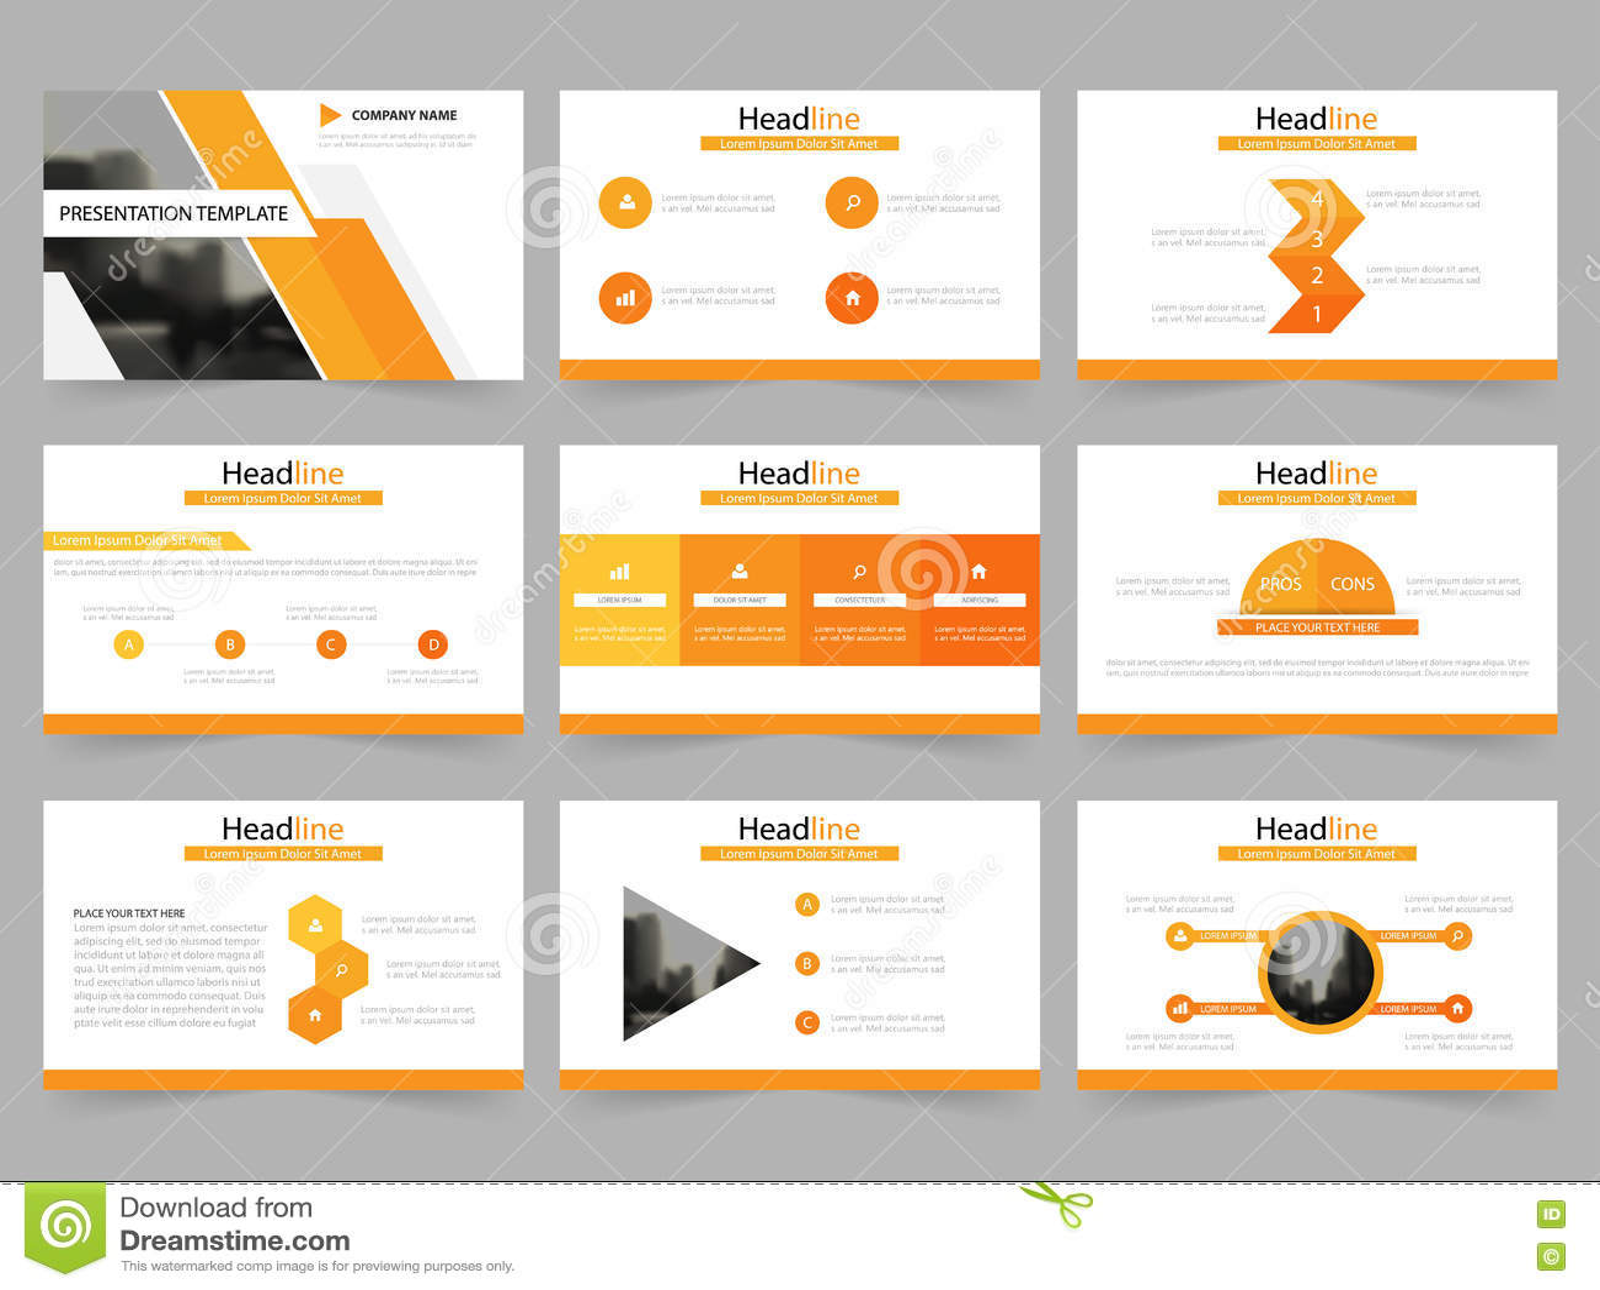 powerpoint presentation template background vector illustration 82901684. Black Bedroom Furniture Sets. Home Design Ideas